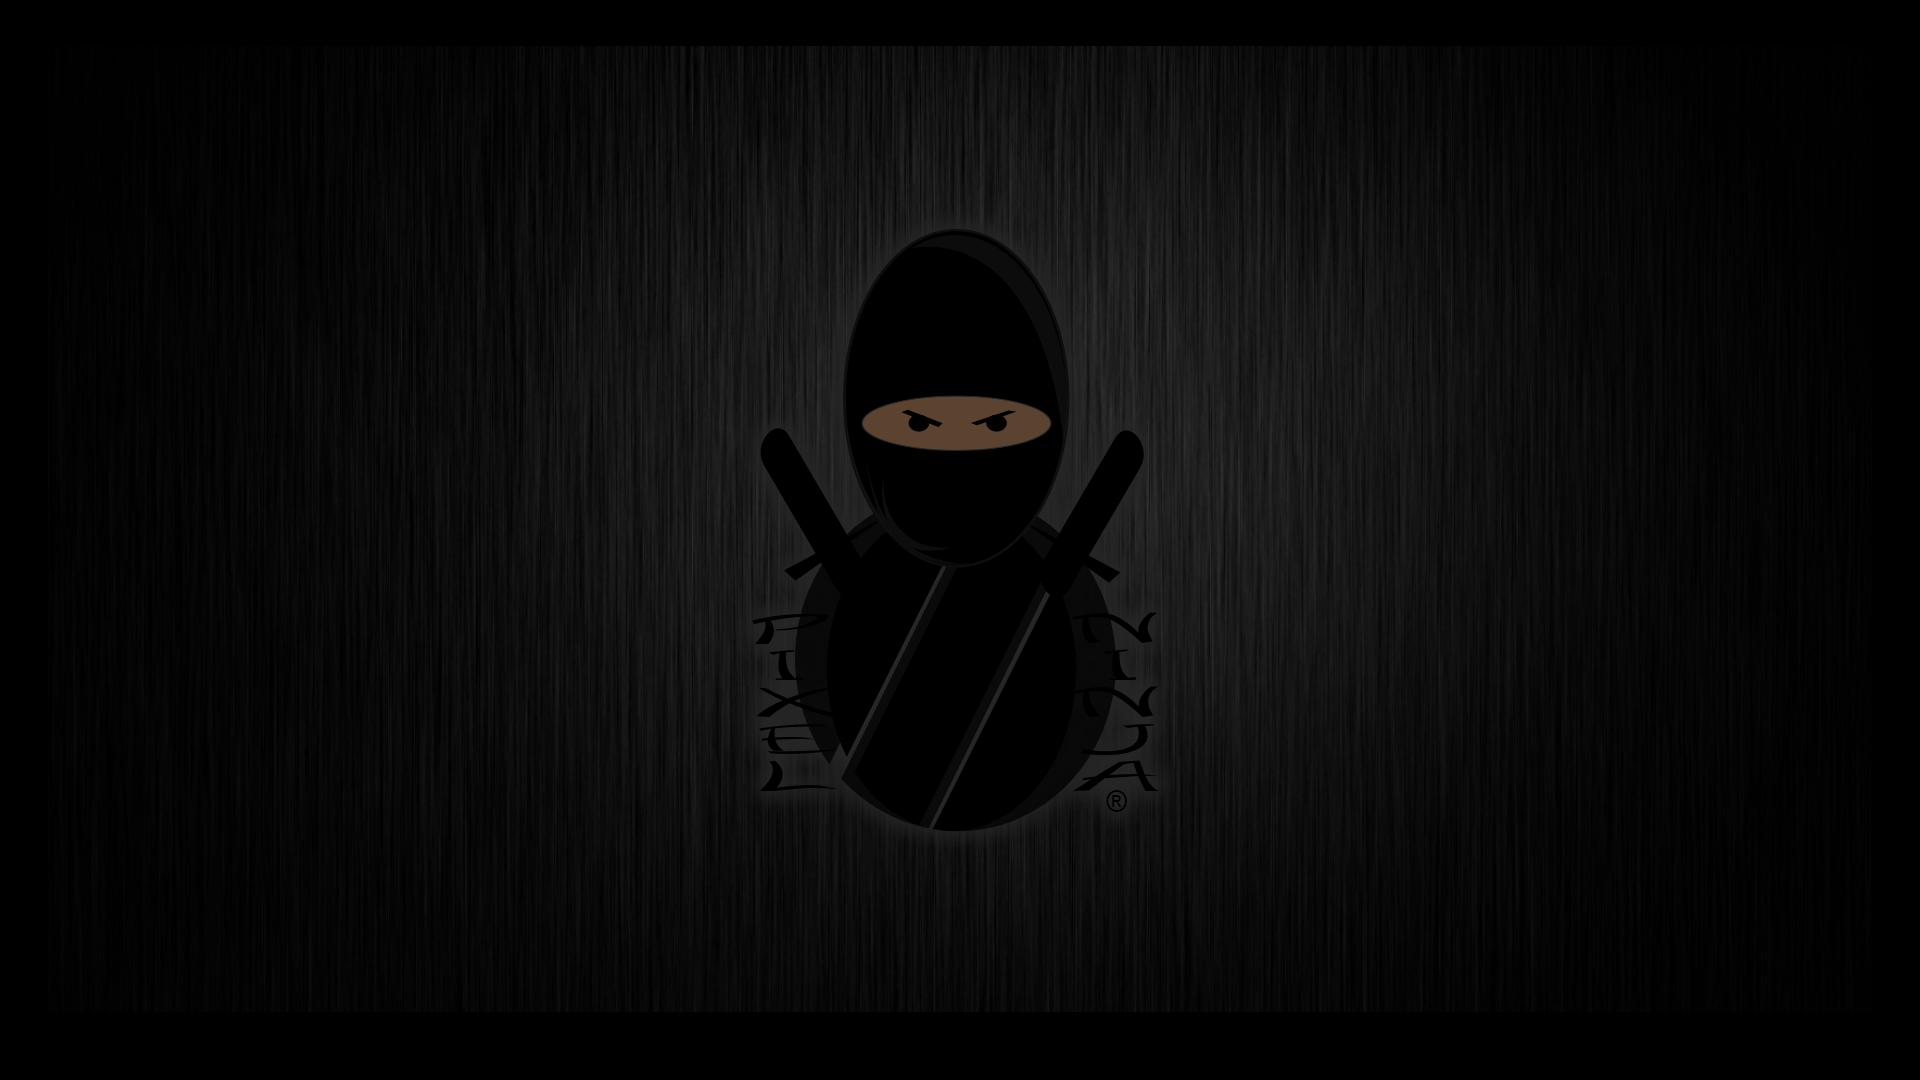 Ninja-desktop-wallpapers - Ninja HD PNG